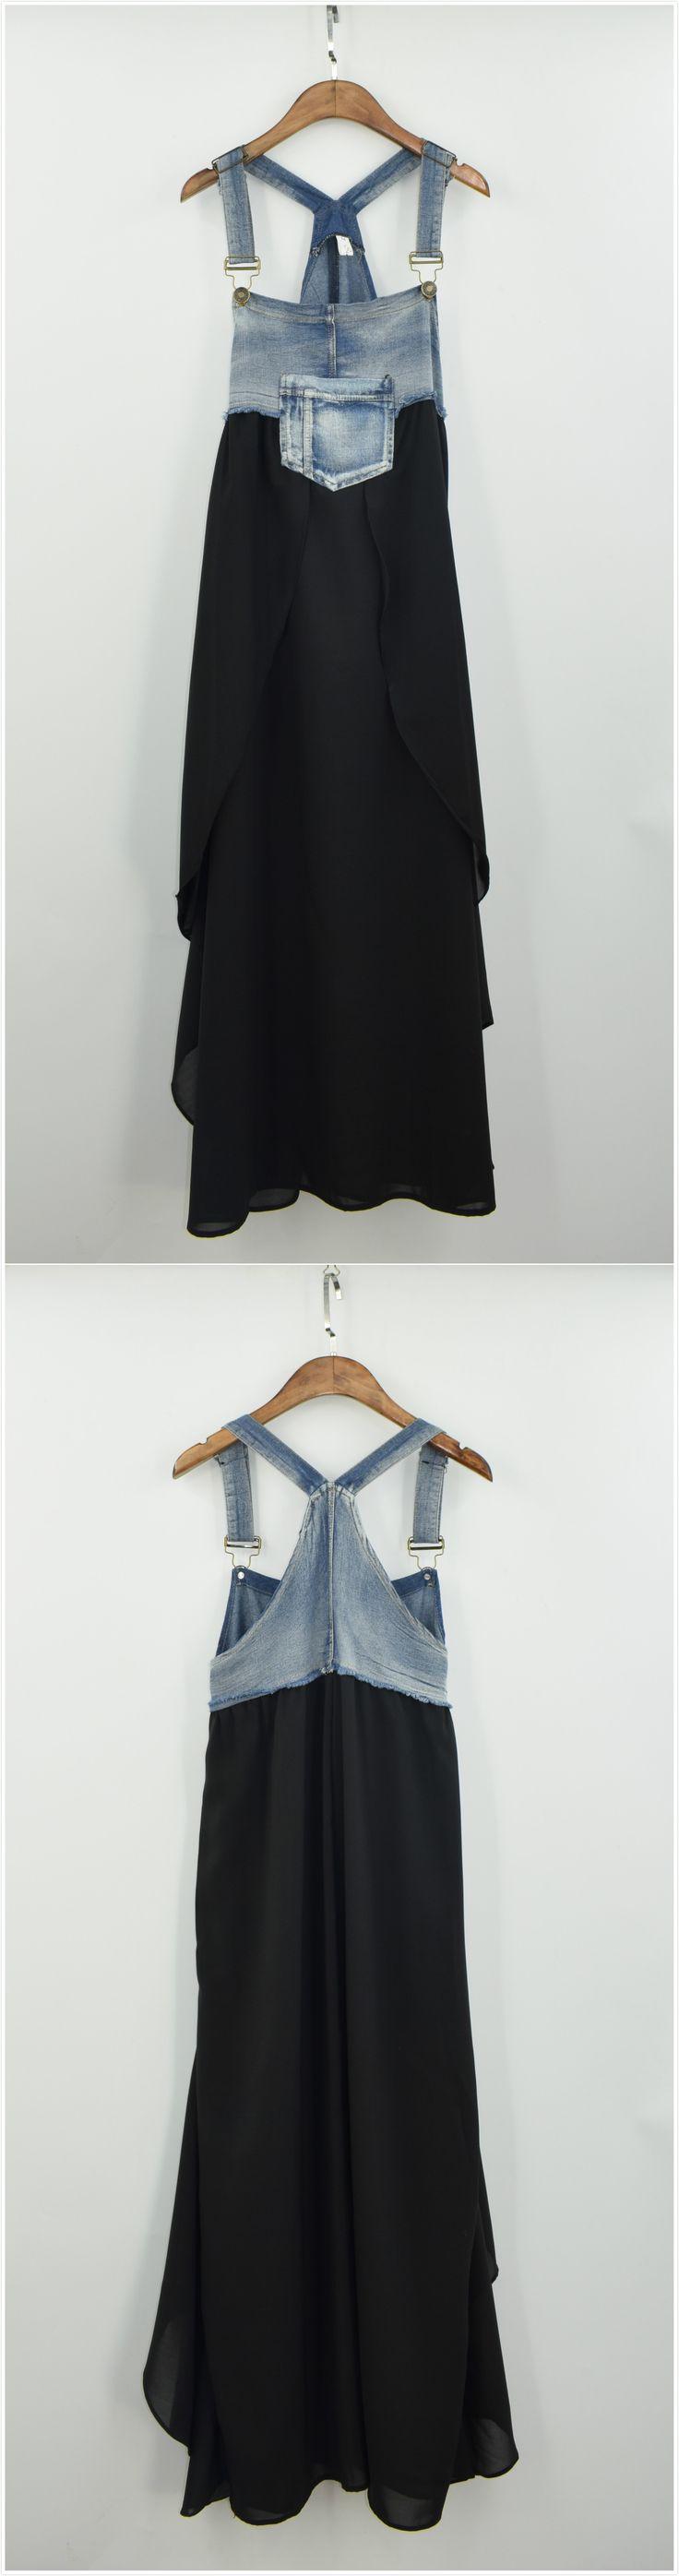 Women's Fashion Summer Denim Chiffon Midi Overalls Dress